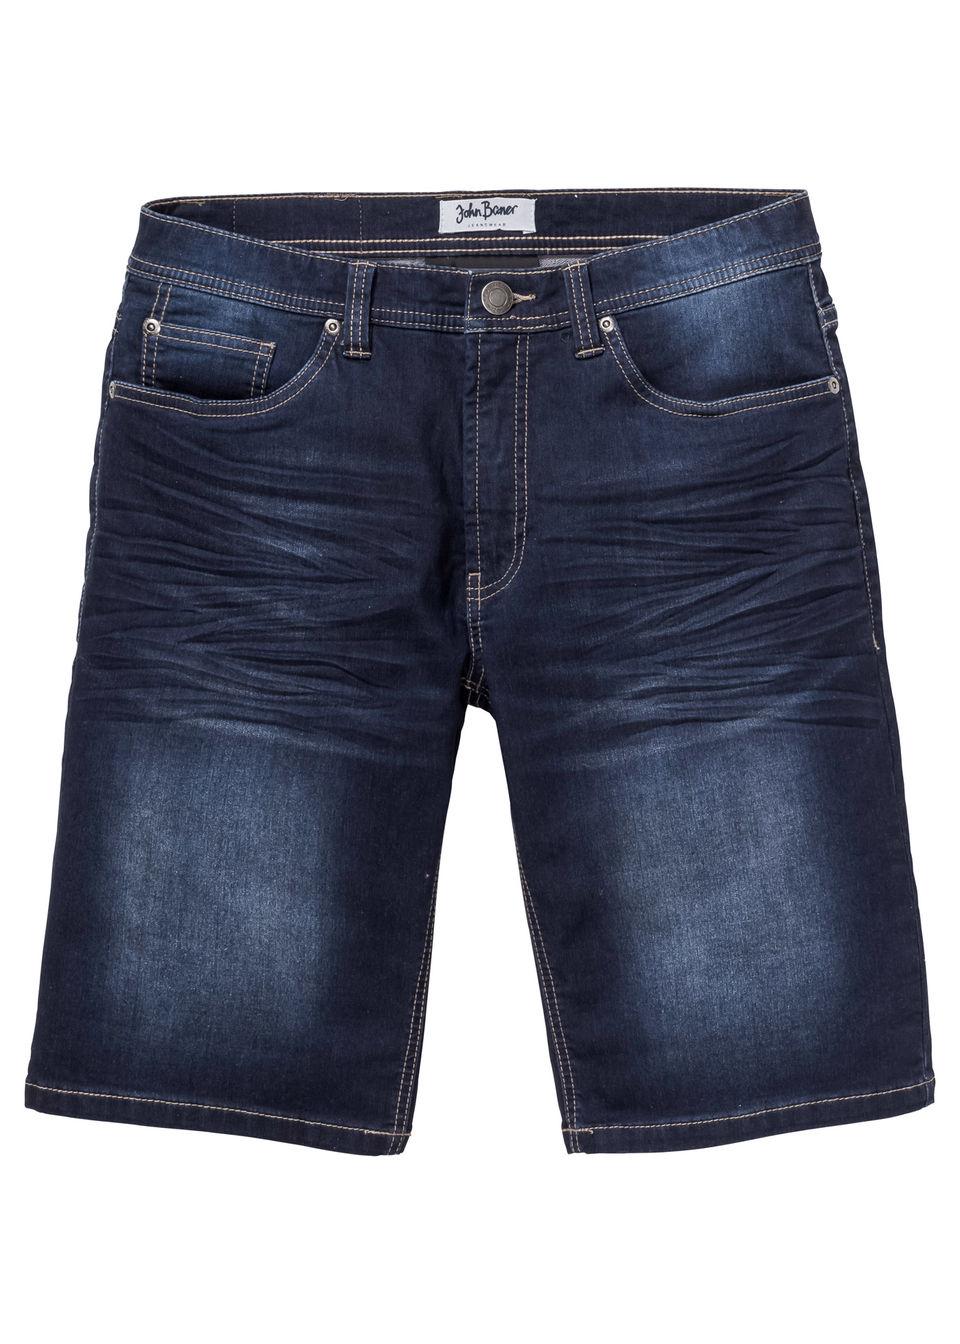 Jeans bermuda Regular fit bonprix